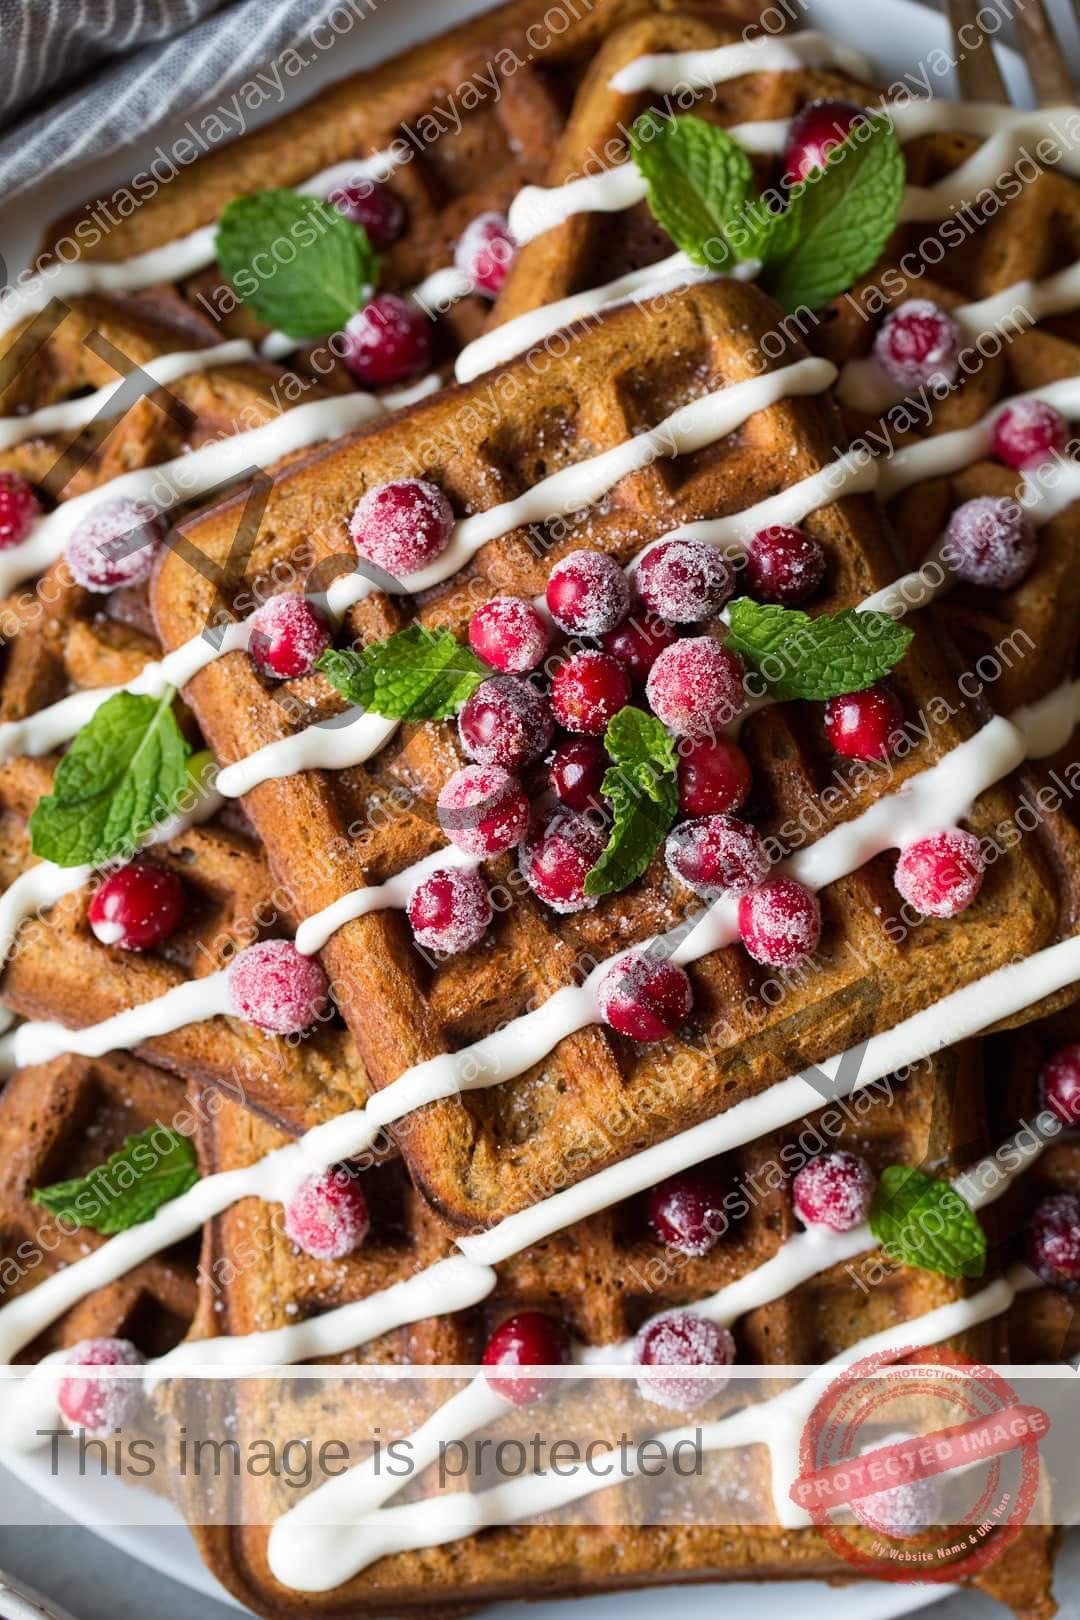 Waffles de jengibre en primer plano